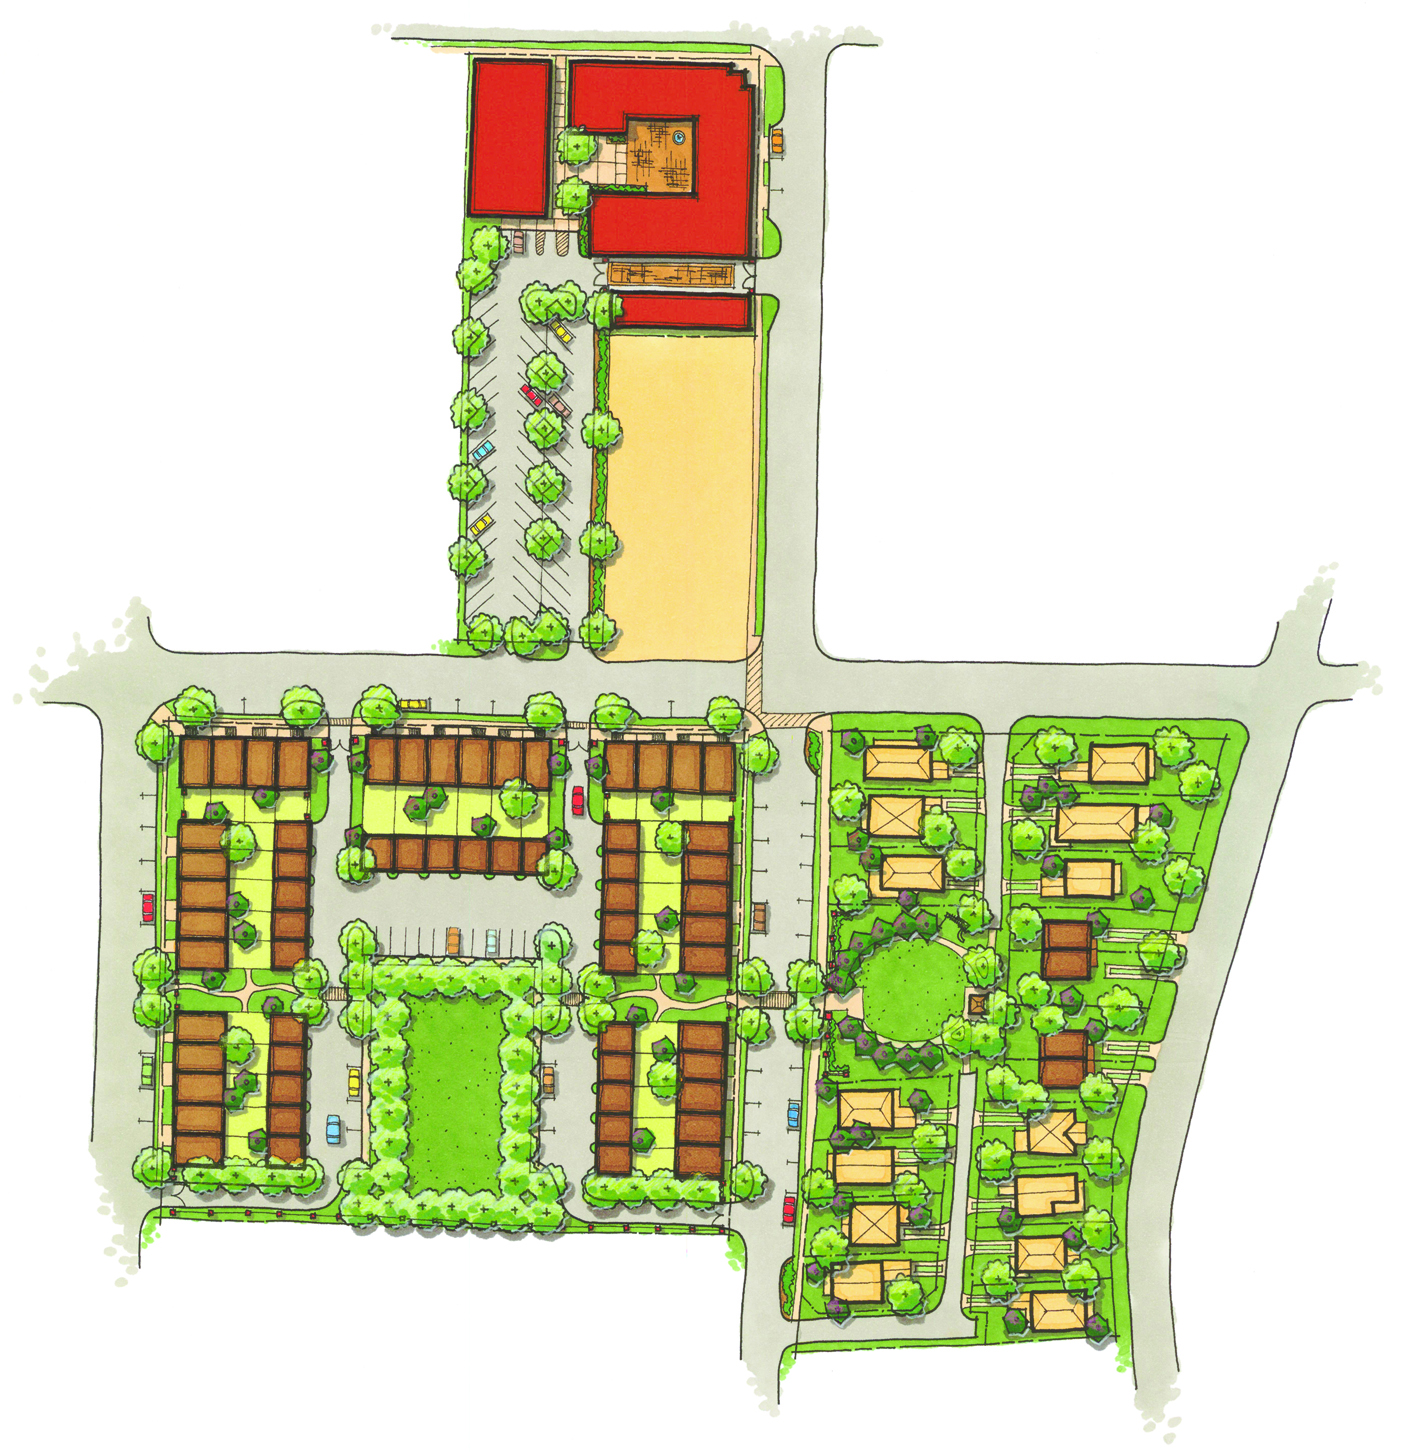 PenWest site plan trg communities